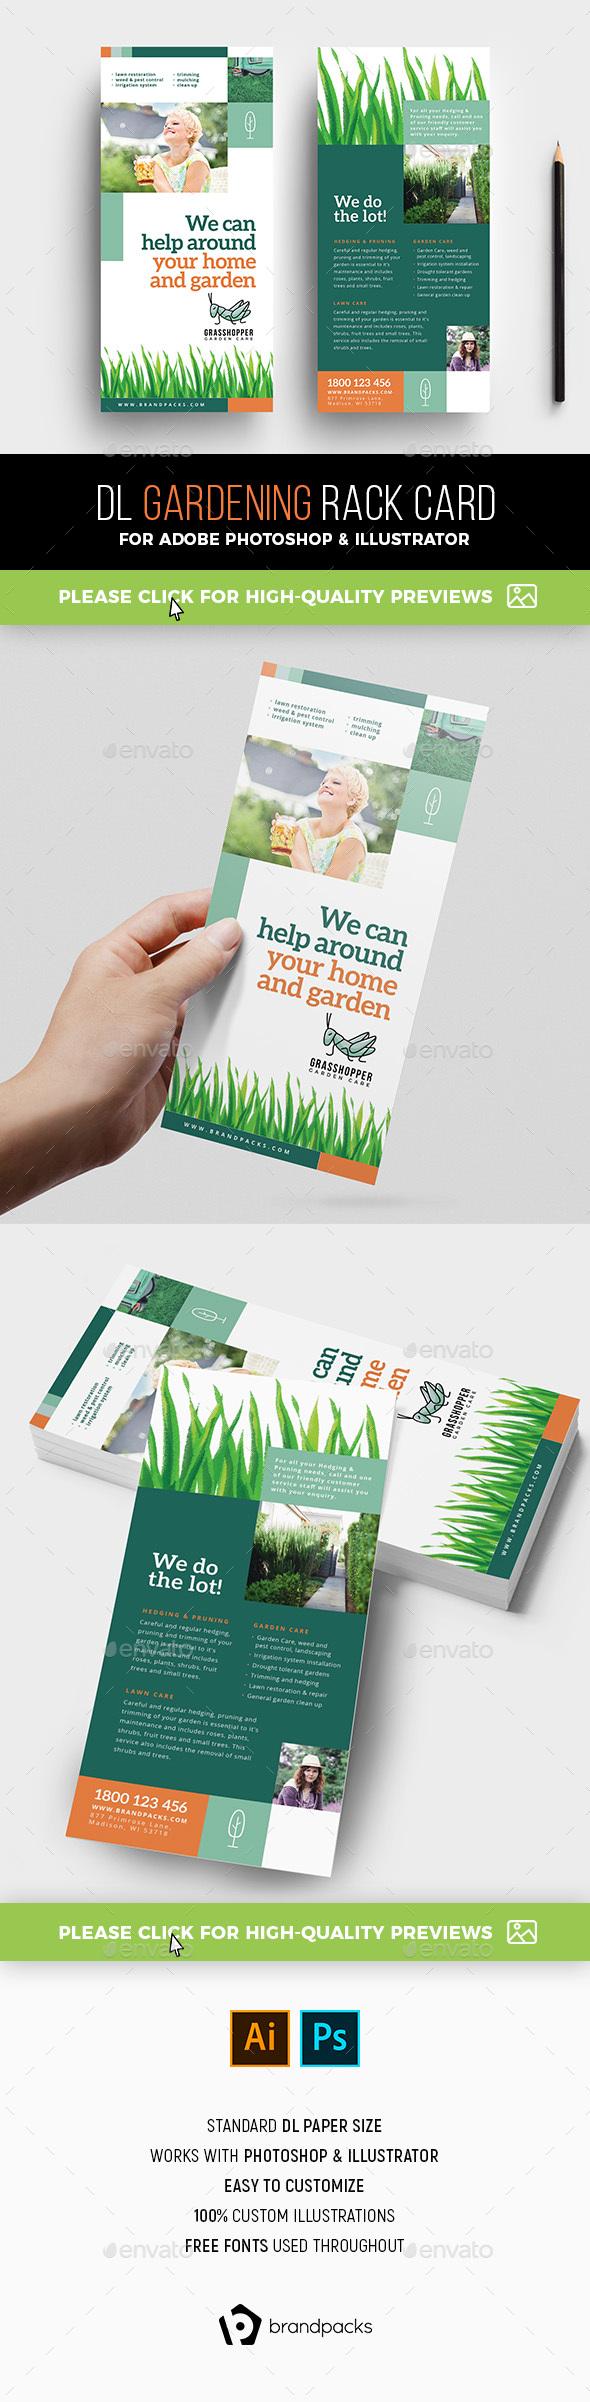 Gardening Rack Card Template - Corporate Flyers